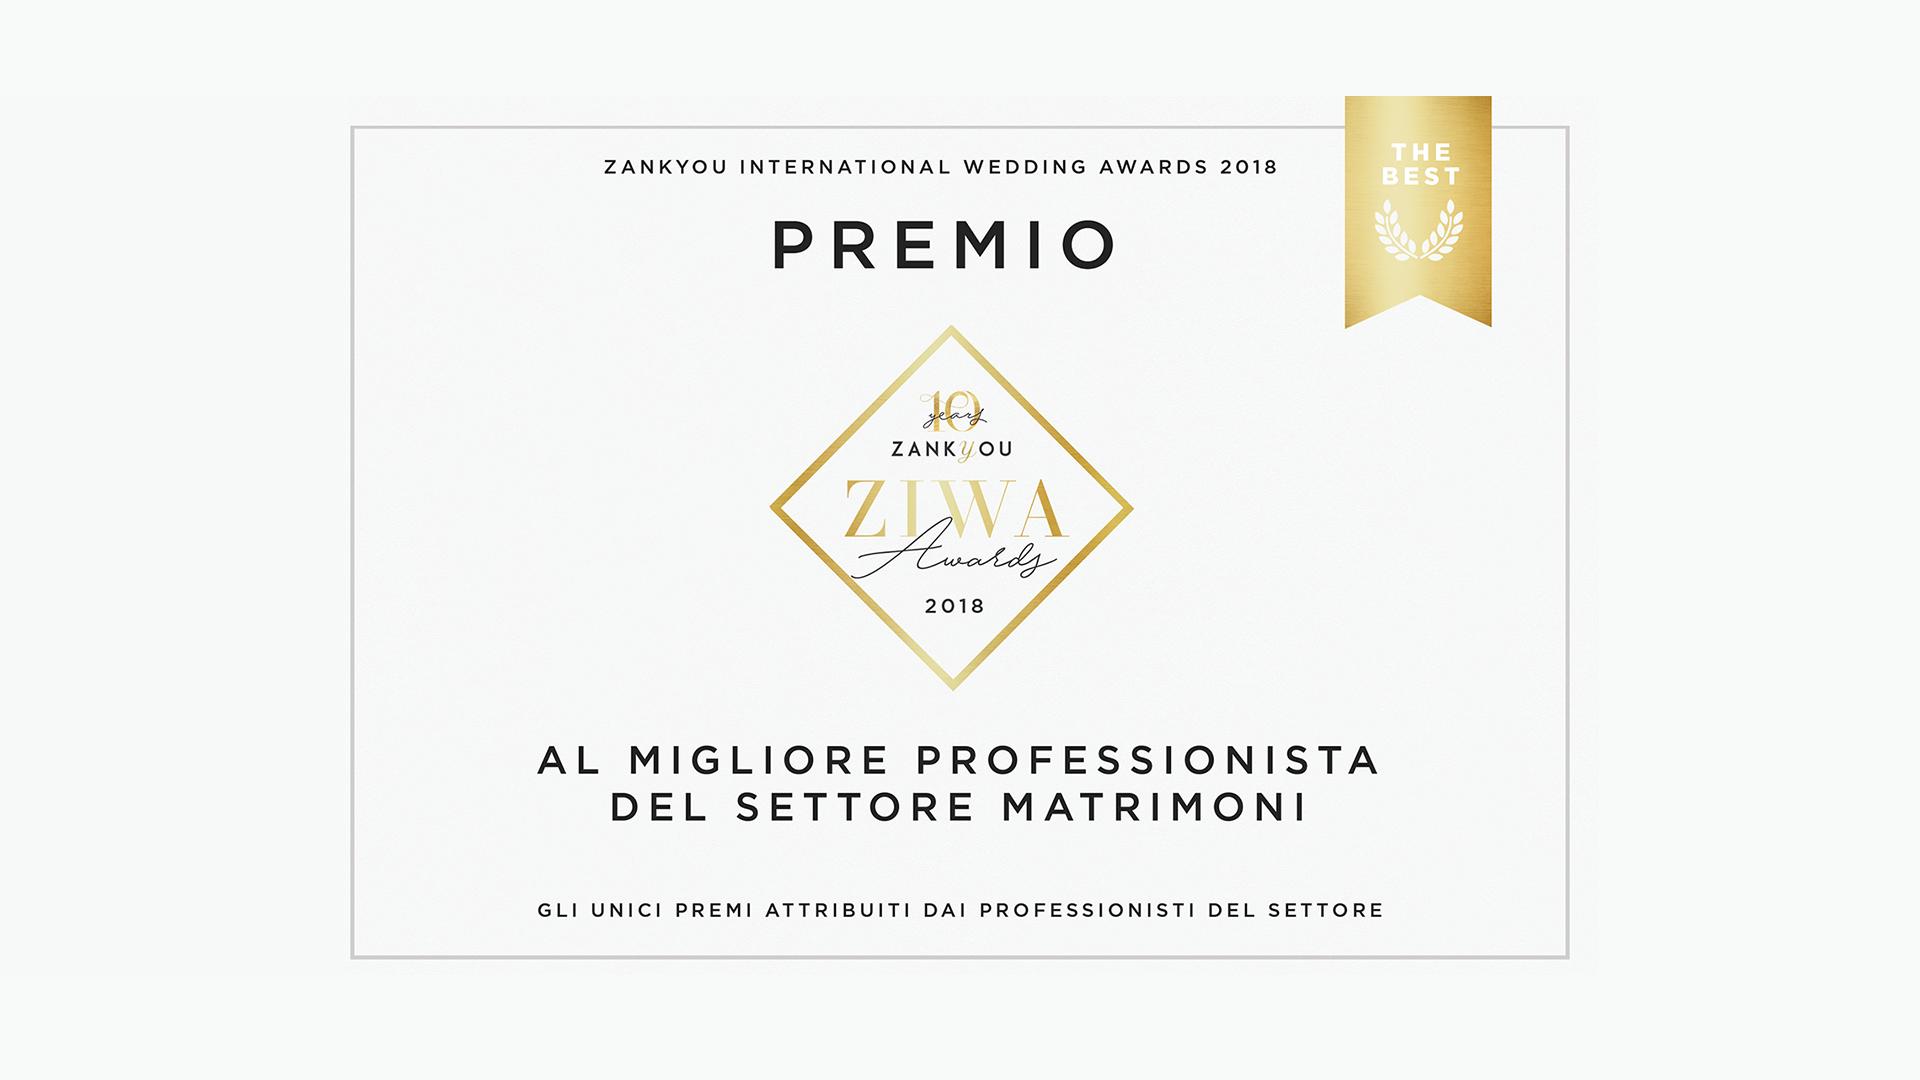 Santo Barbagallo mod diploma_ITbv